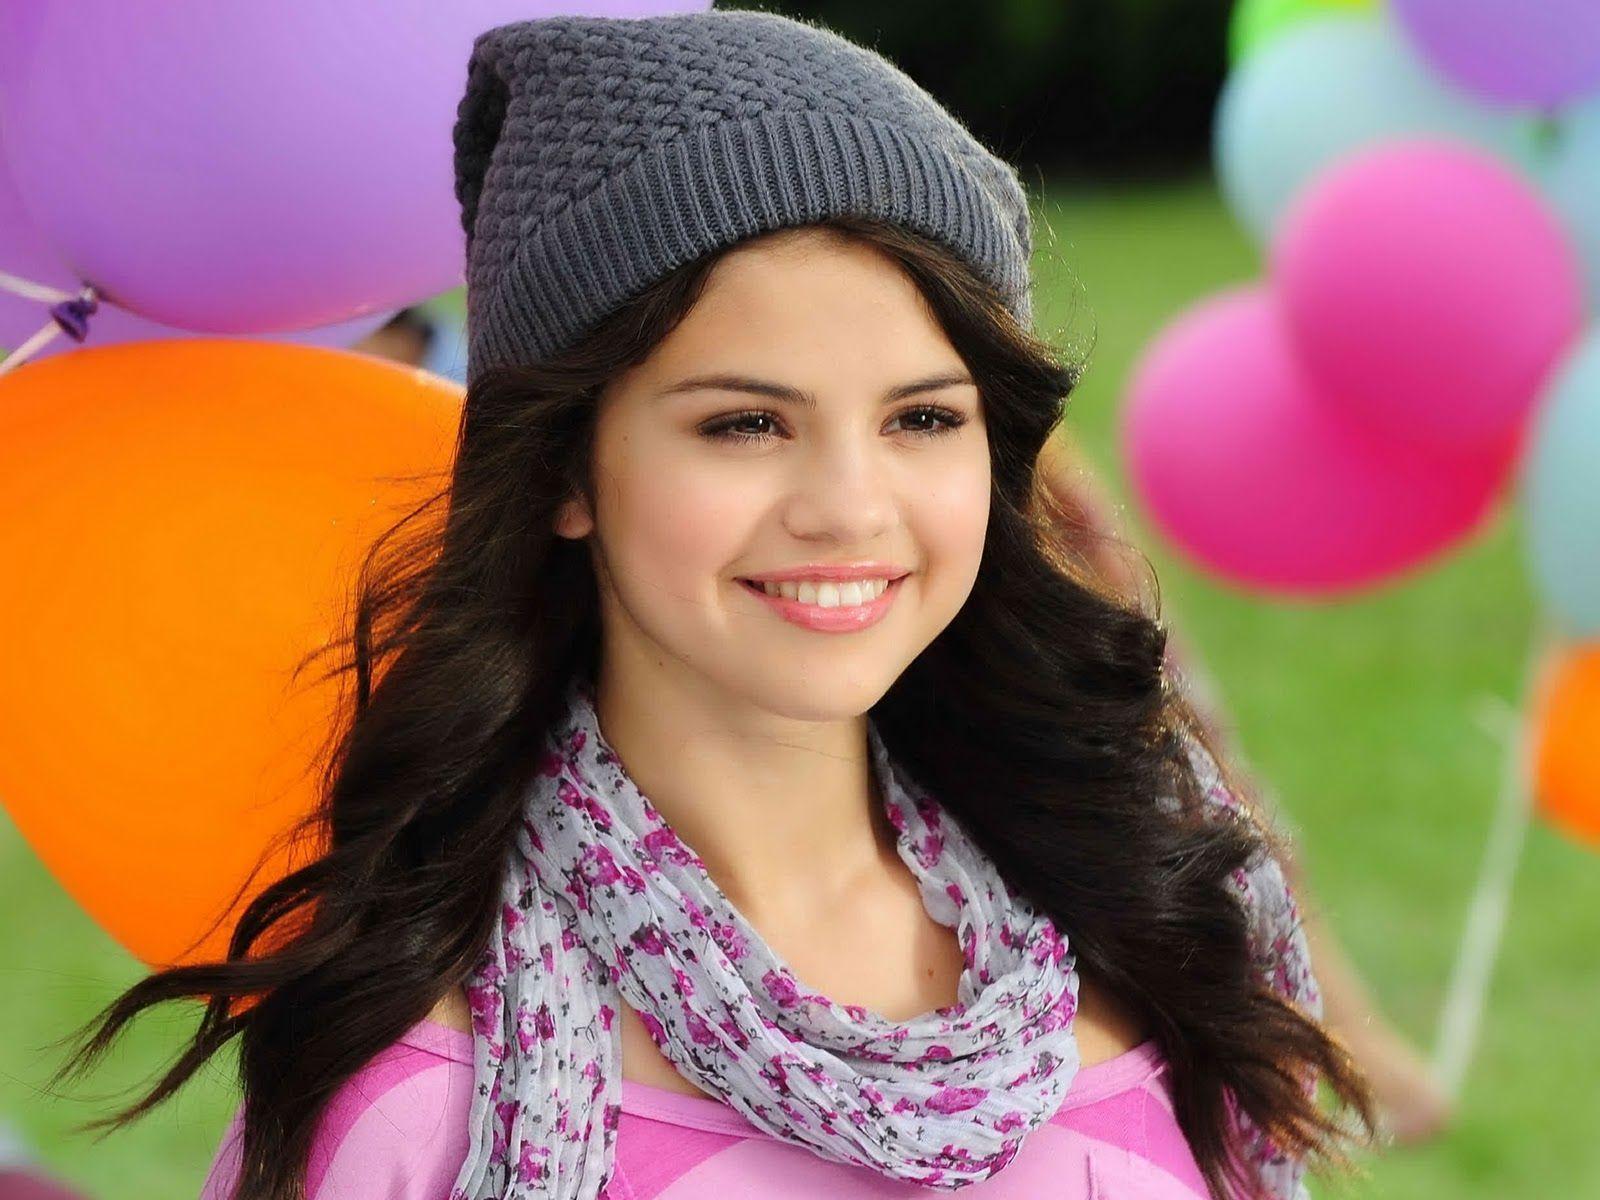 Selena Gomez Wallpapers - HD Wallpapers Inn